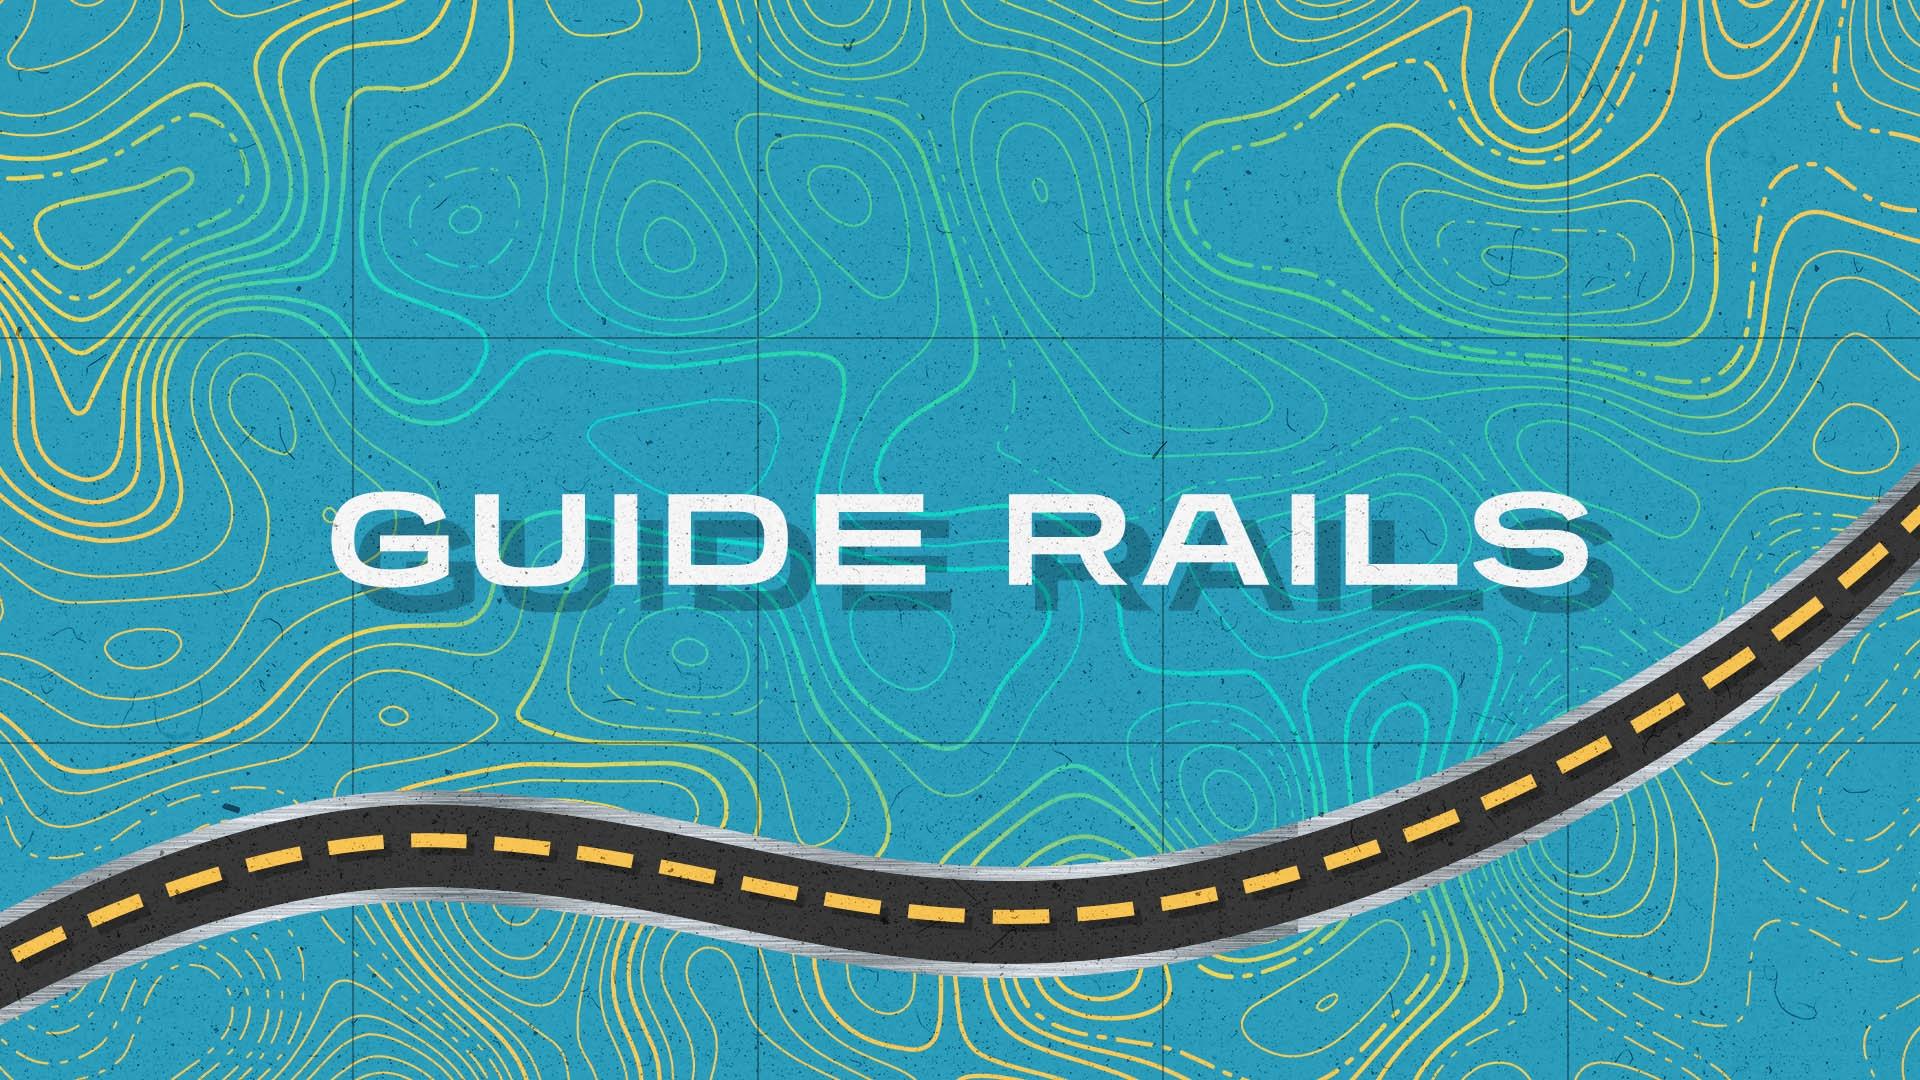 """Guide RAILS"""